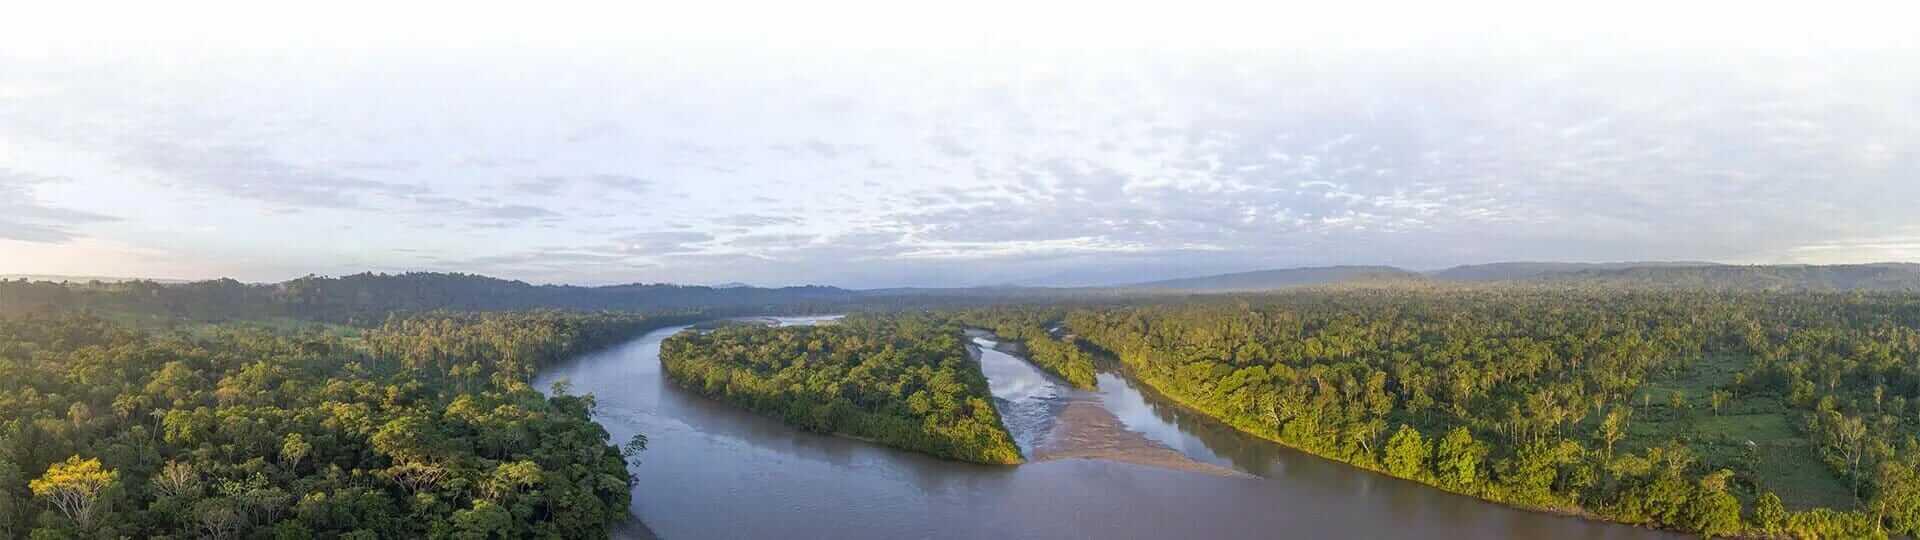 ecuador amazon rainforest banner